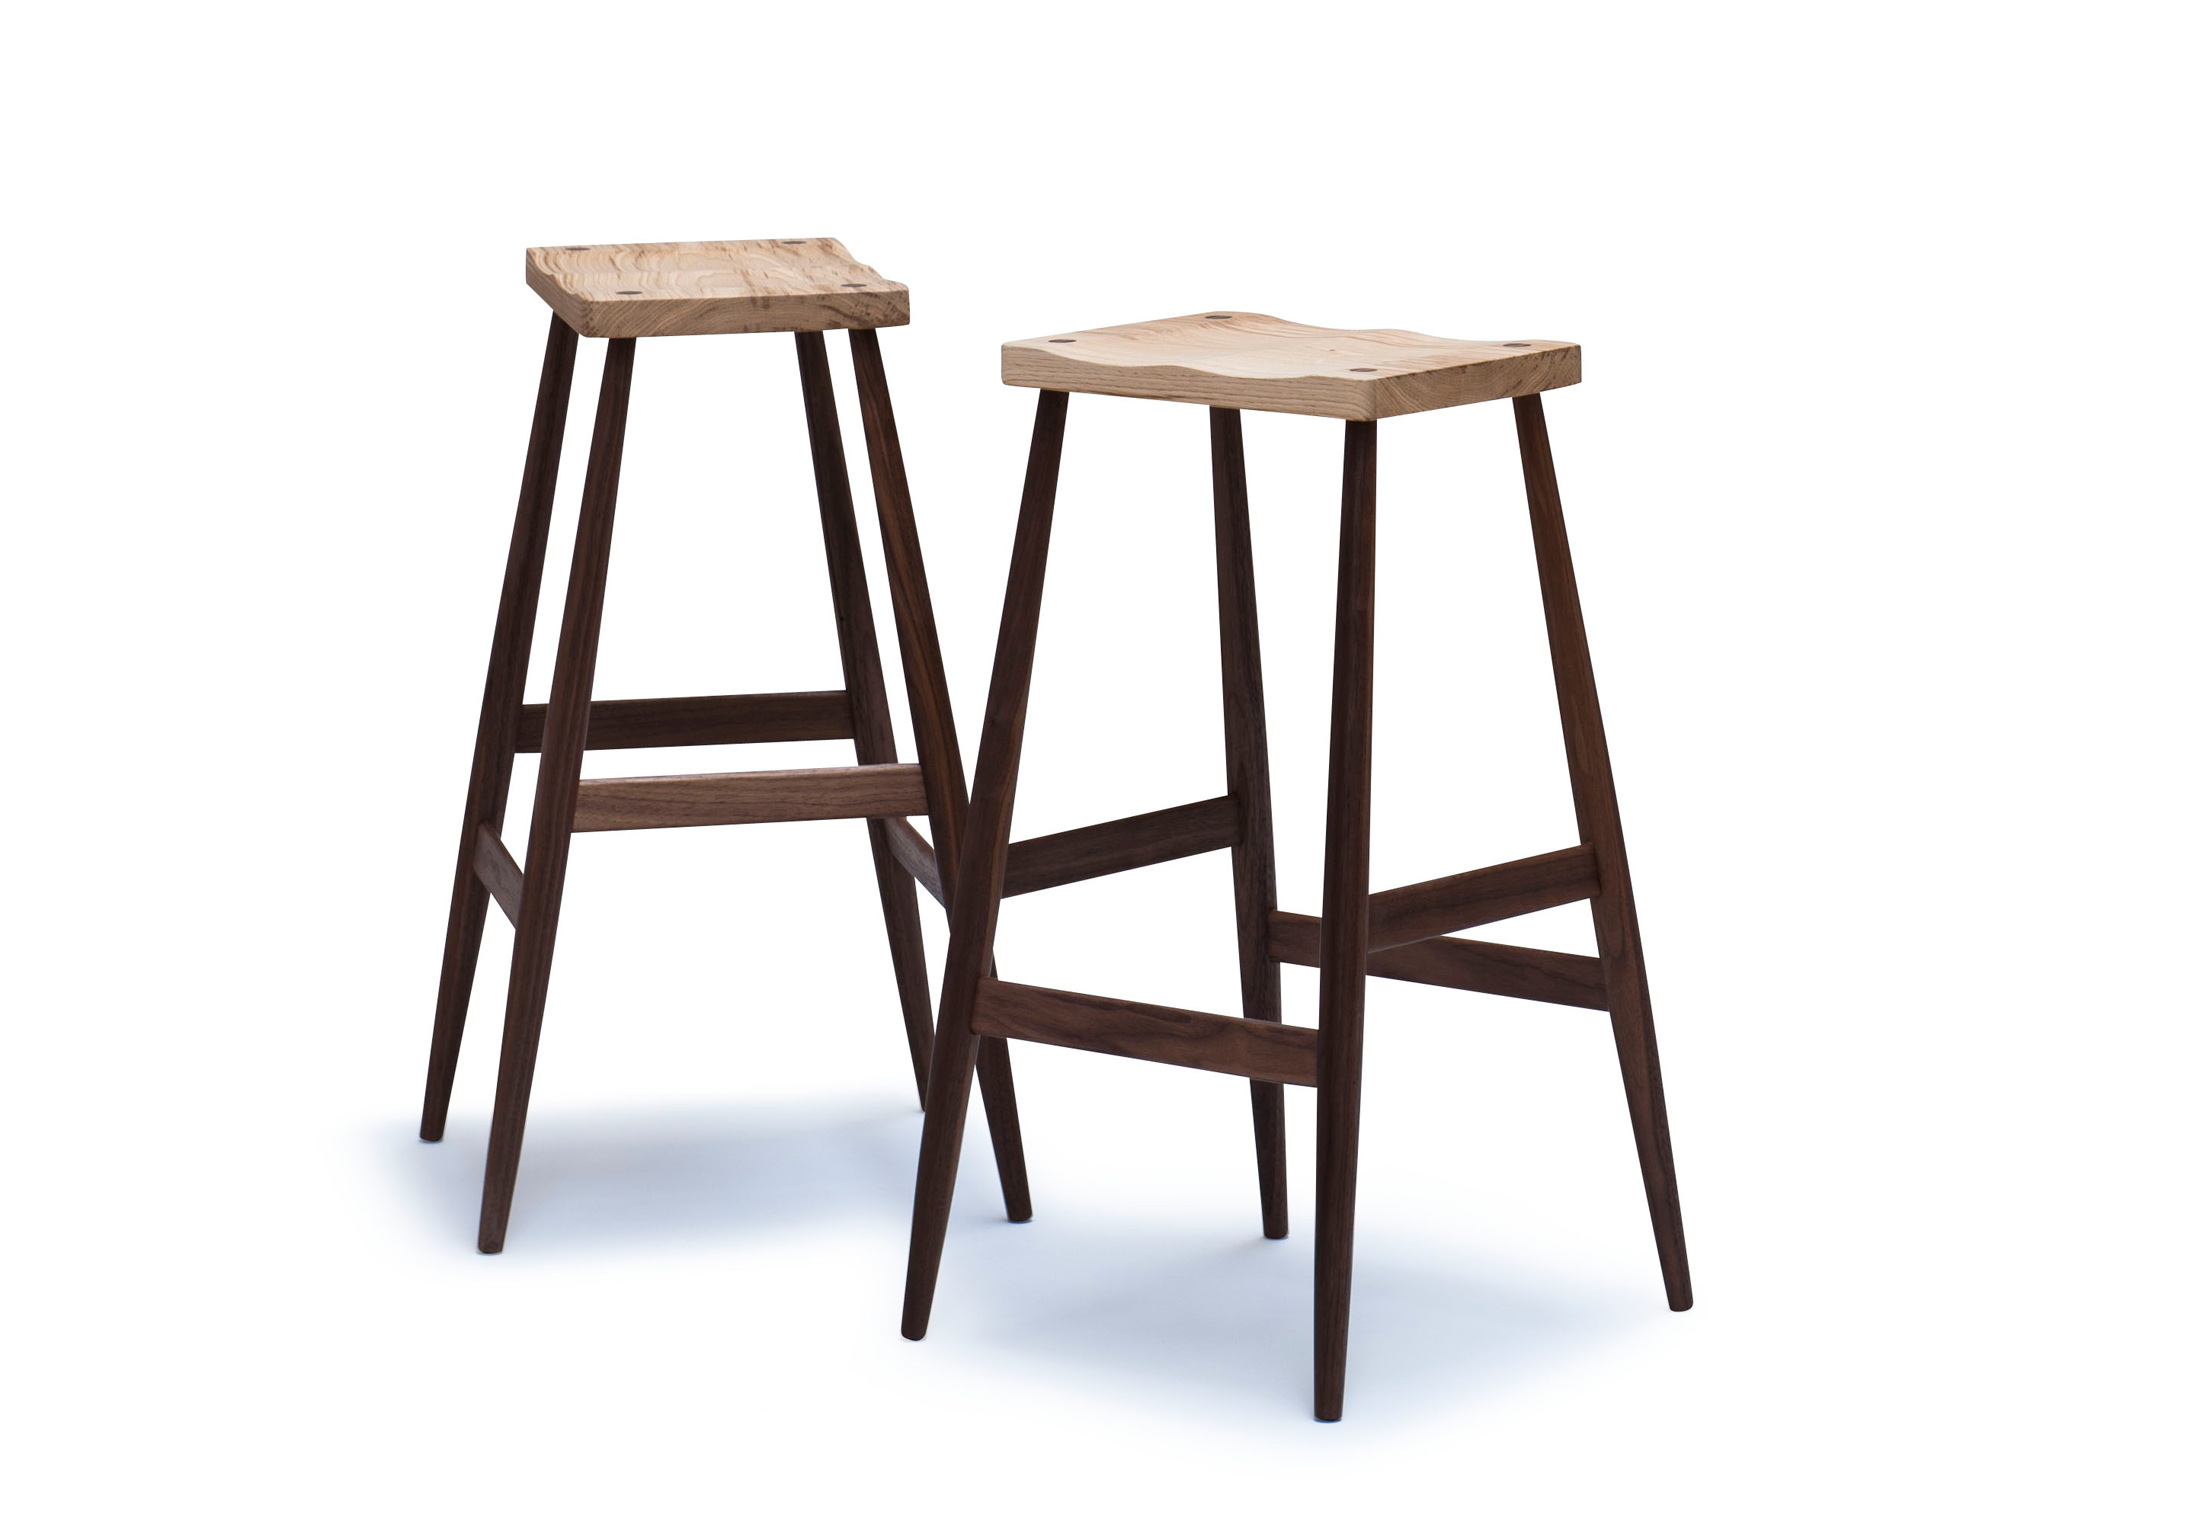 Awe Inspiring Imo Bar Stool By Pinch Stylepark Uwap Interior Chair Design Uwaporg